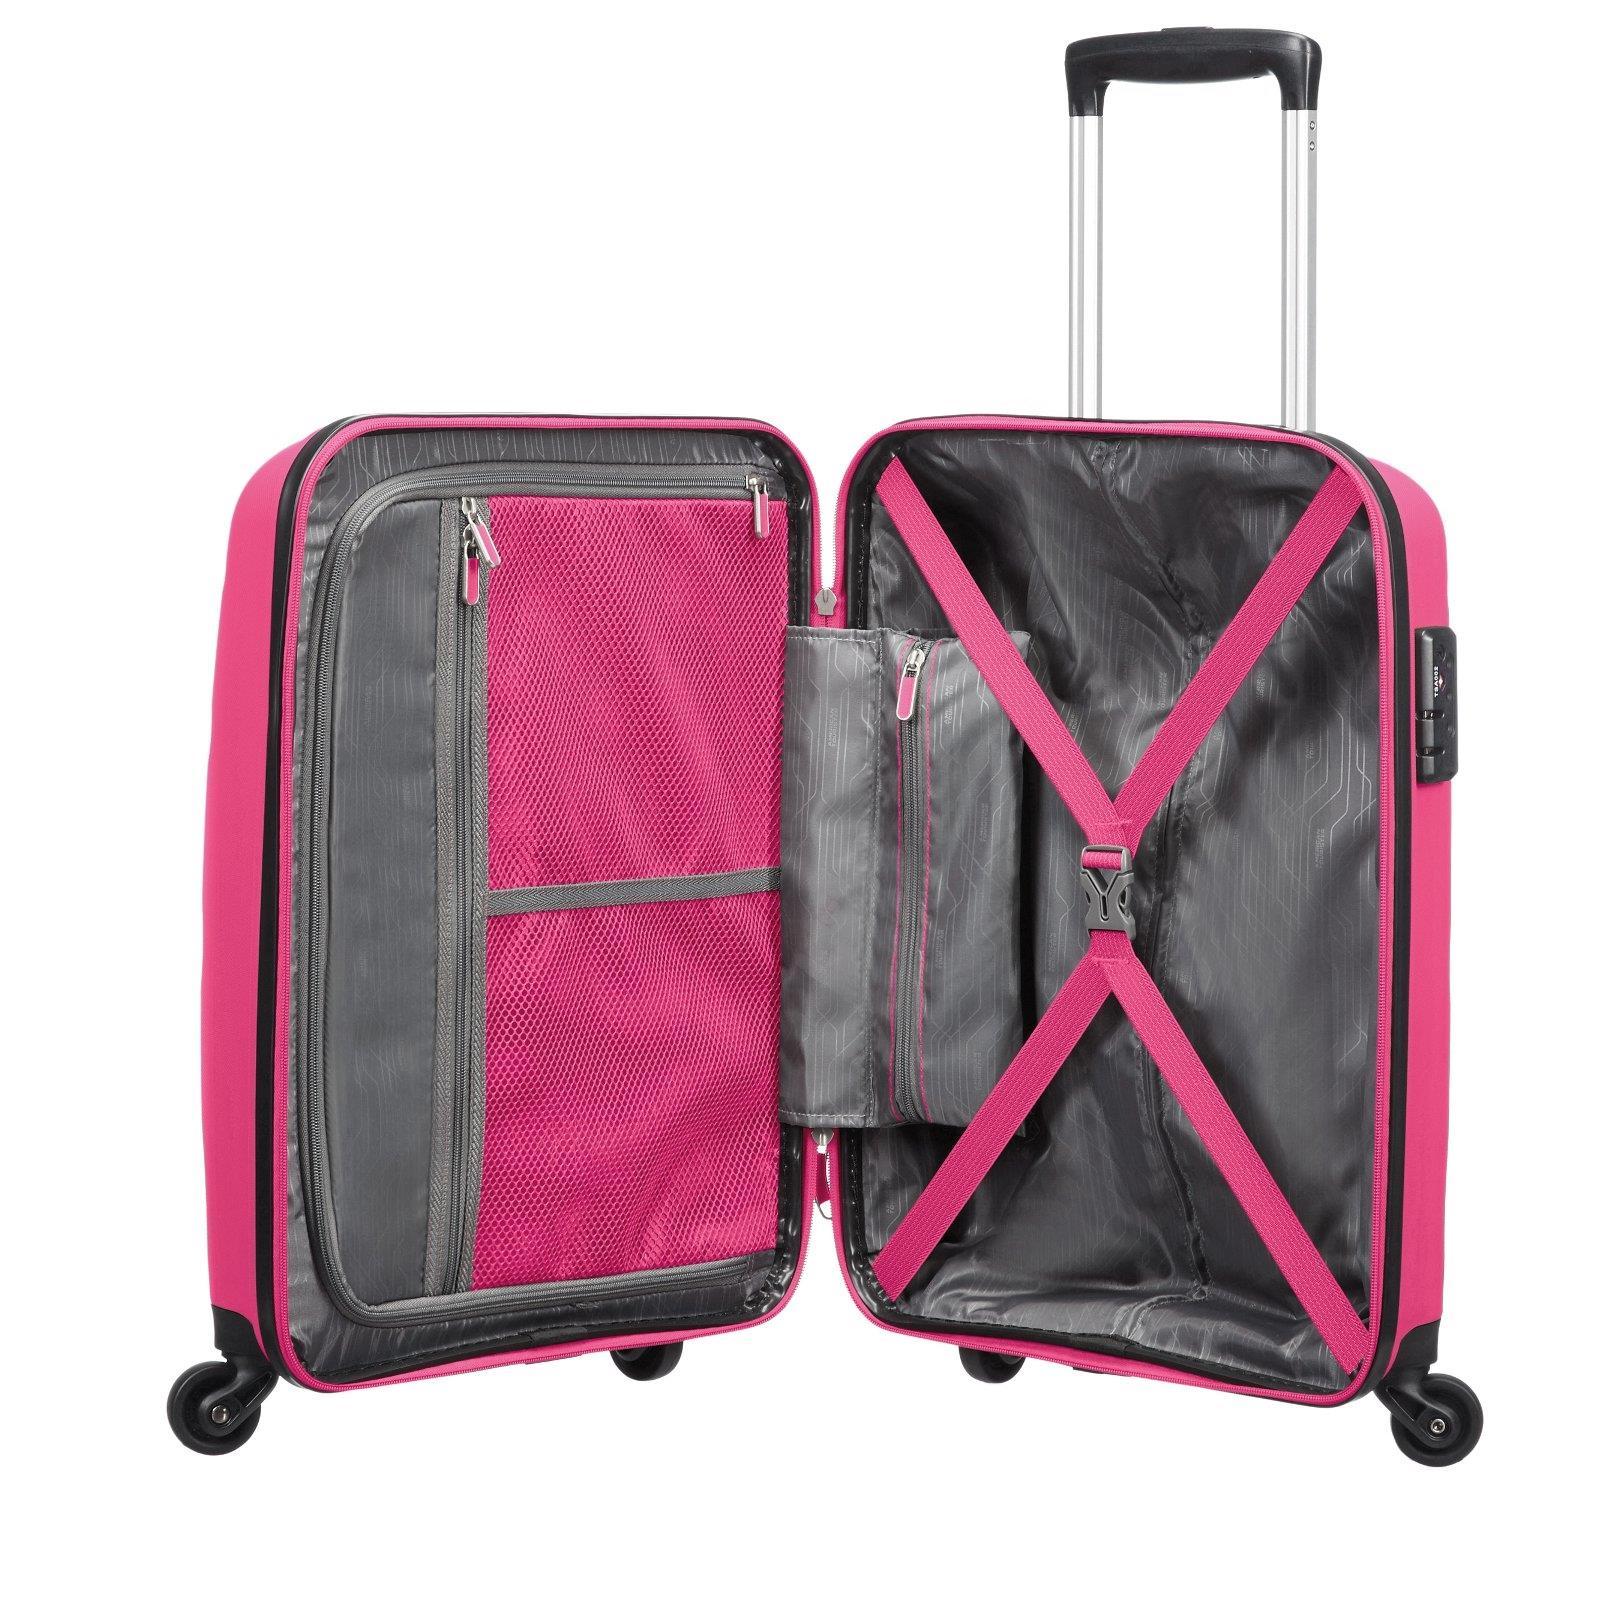 american tourister by samsonite bon air spinner trolley reise koffer 55 66 75 cm ebay. Black Bedroom Furniture Sets. Home Design Ideas